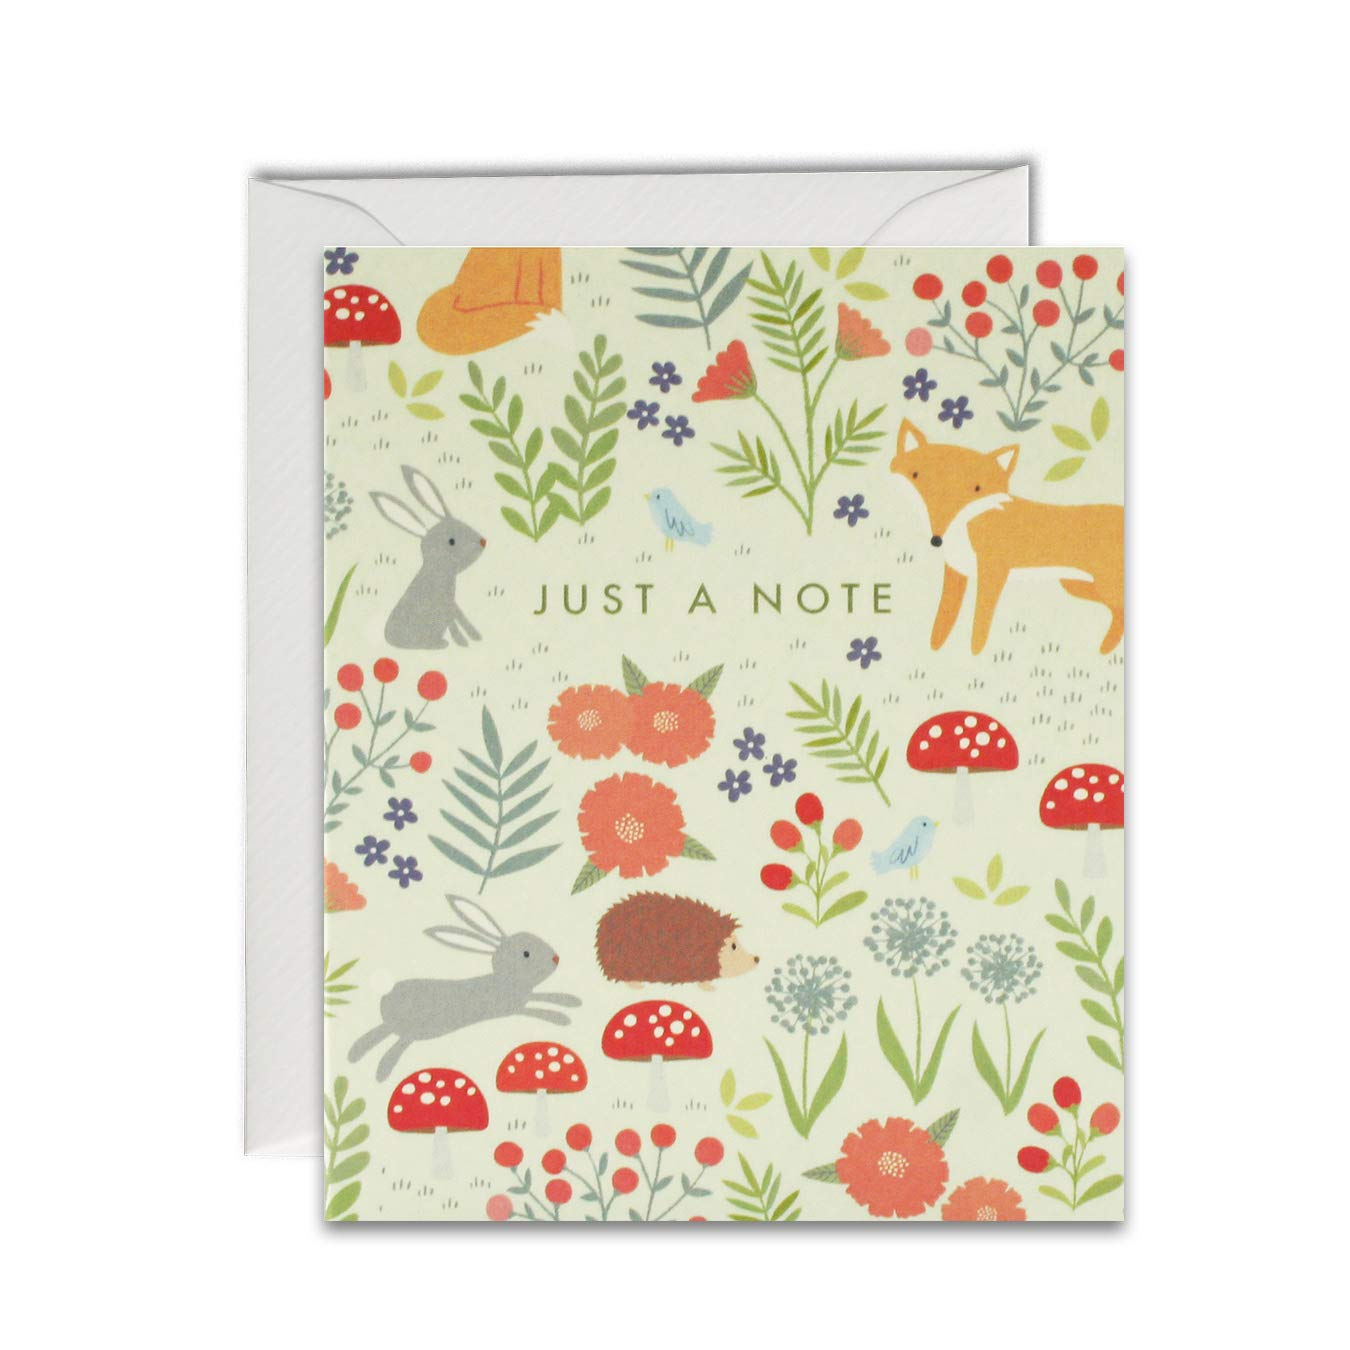 - MC3001 Woodland Just A Note Mini Card James Ellis Pack of 5